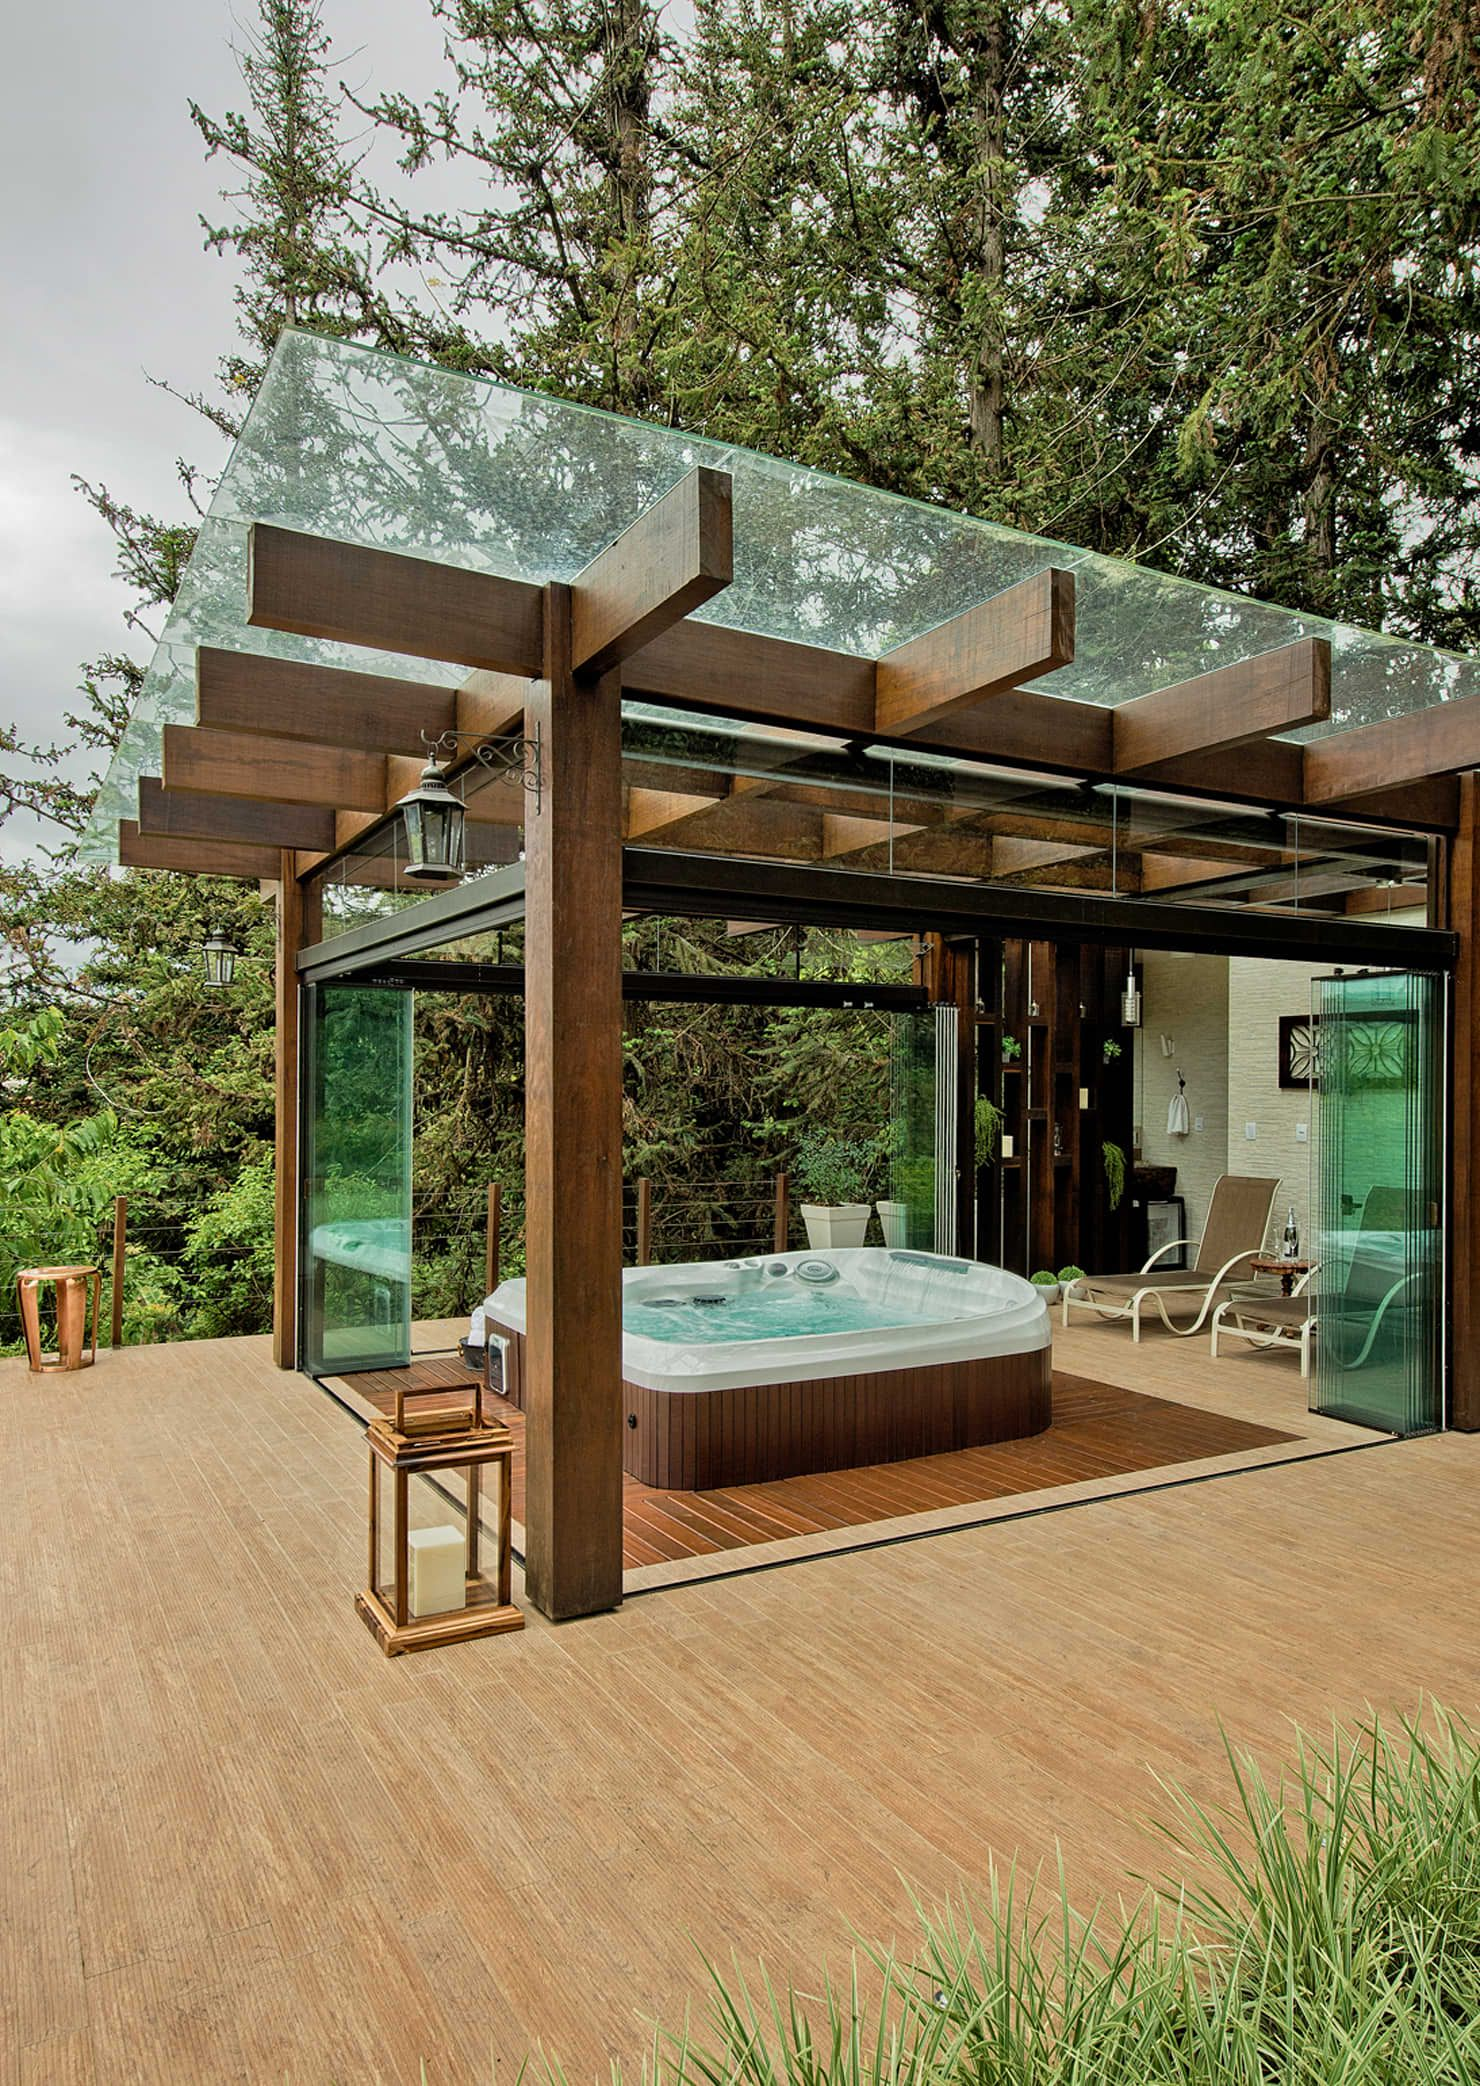 Spa Da Floresta Spa Rustico Por Espaco Do Traco Arquitetura Rustico Homify Techo De Patio Pergolas De Madera Diseno De Terraza